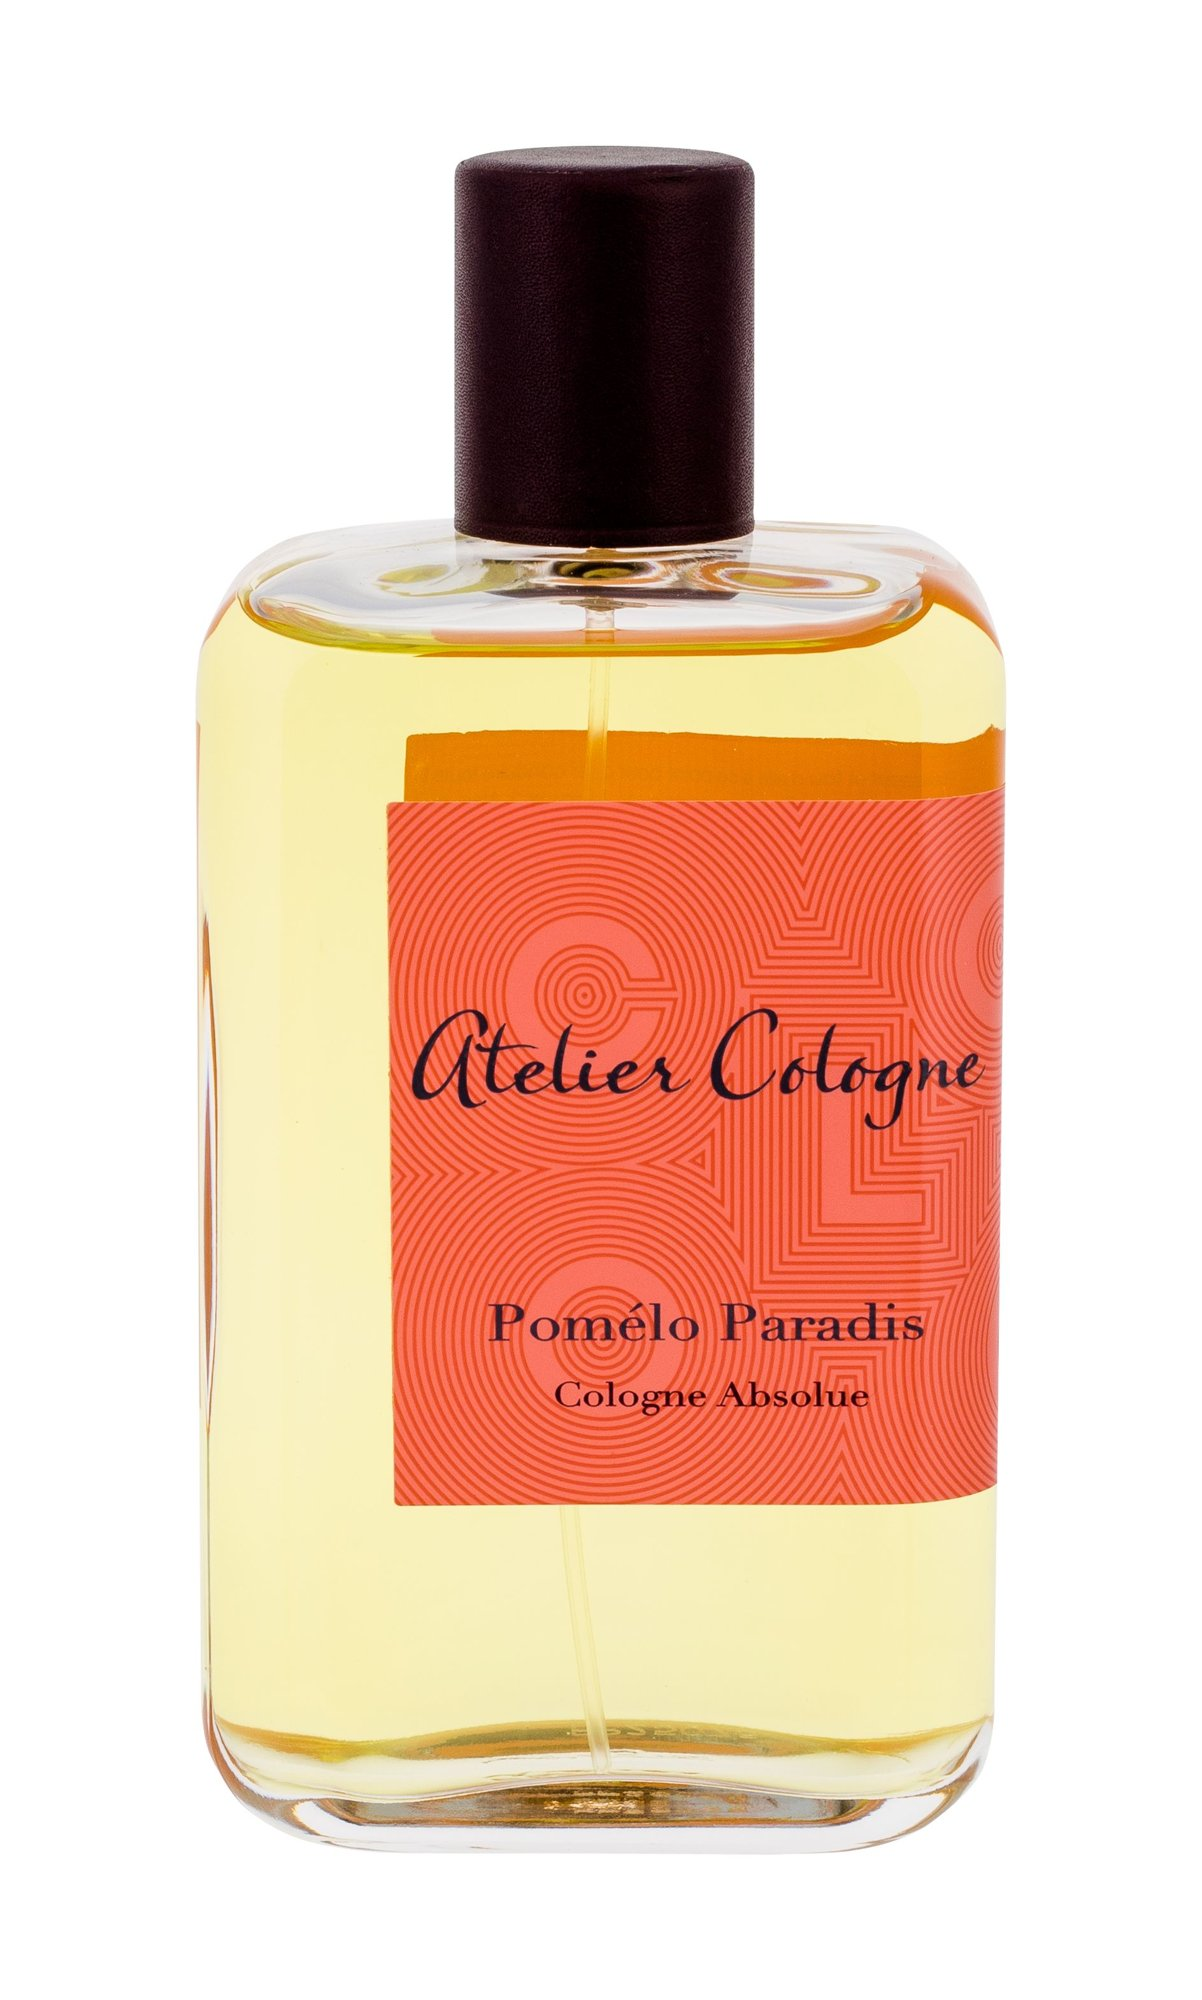 Atelier Cologne Pomélo Paradis Perfume 200ml